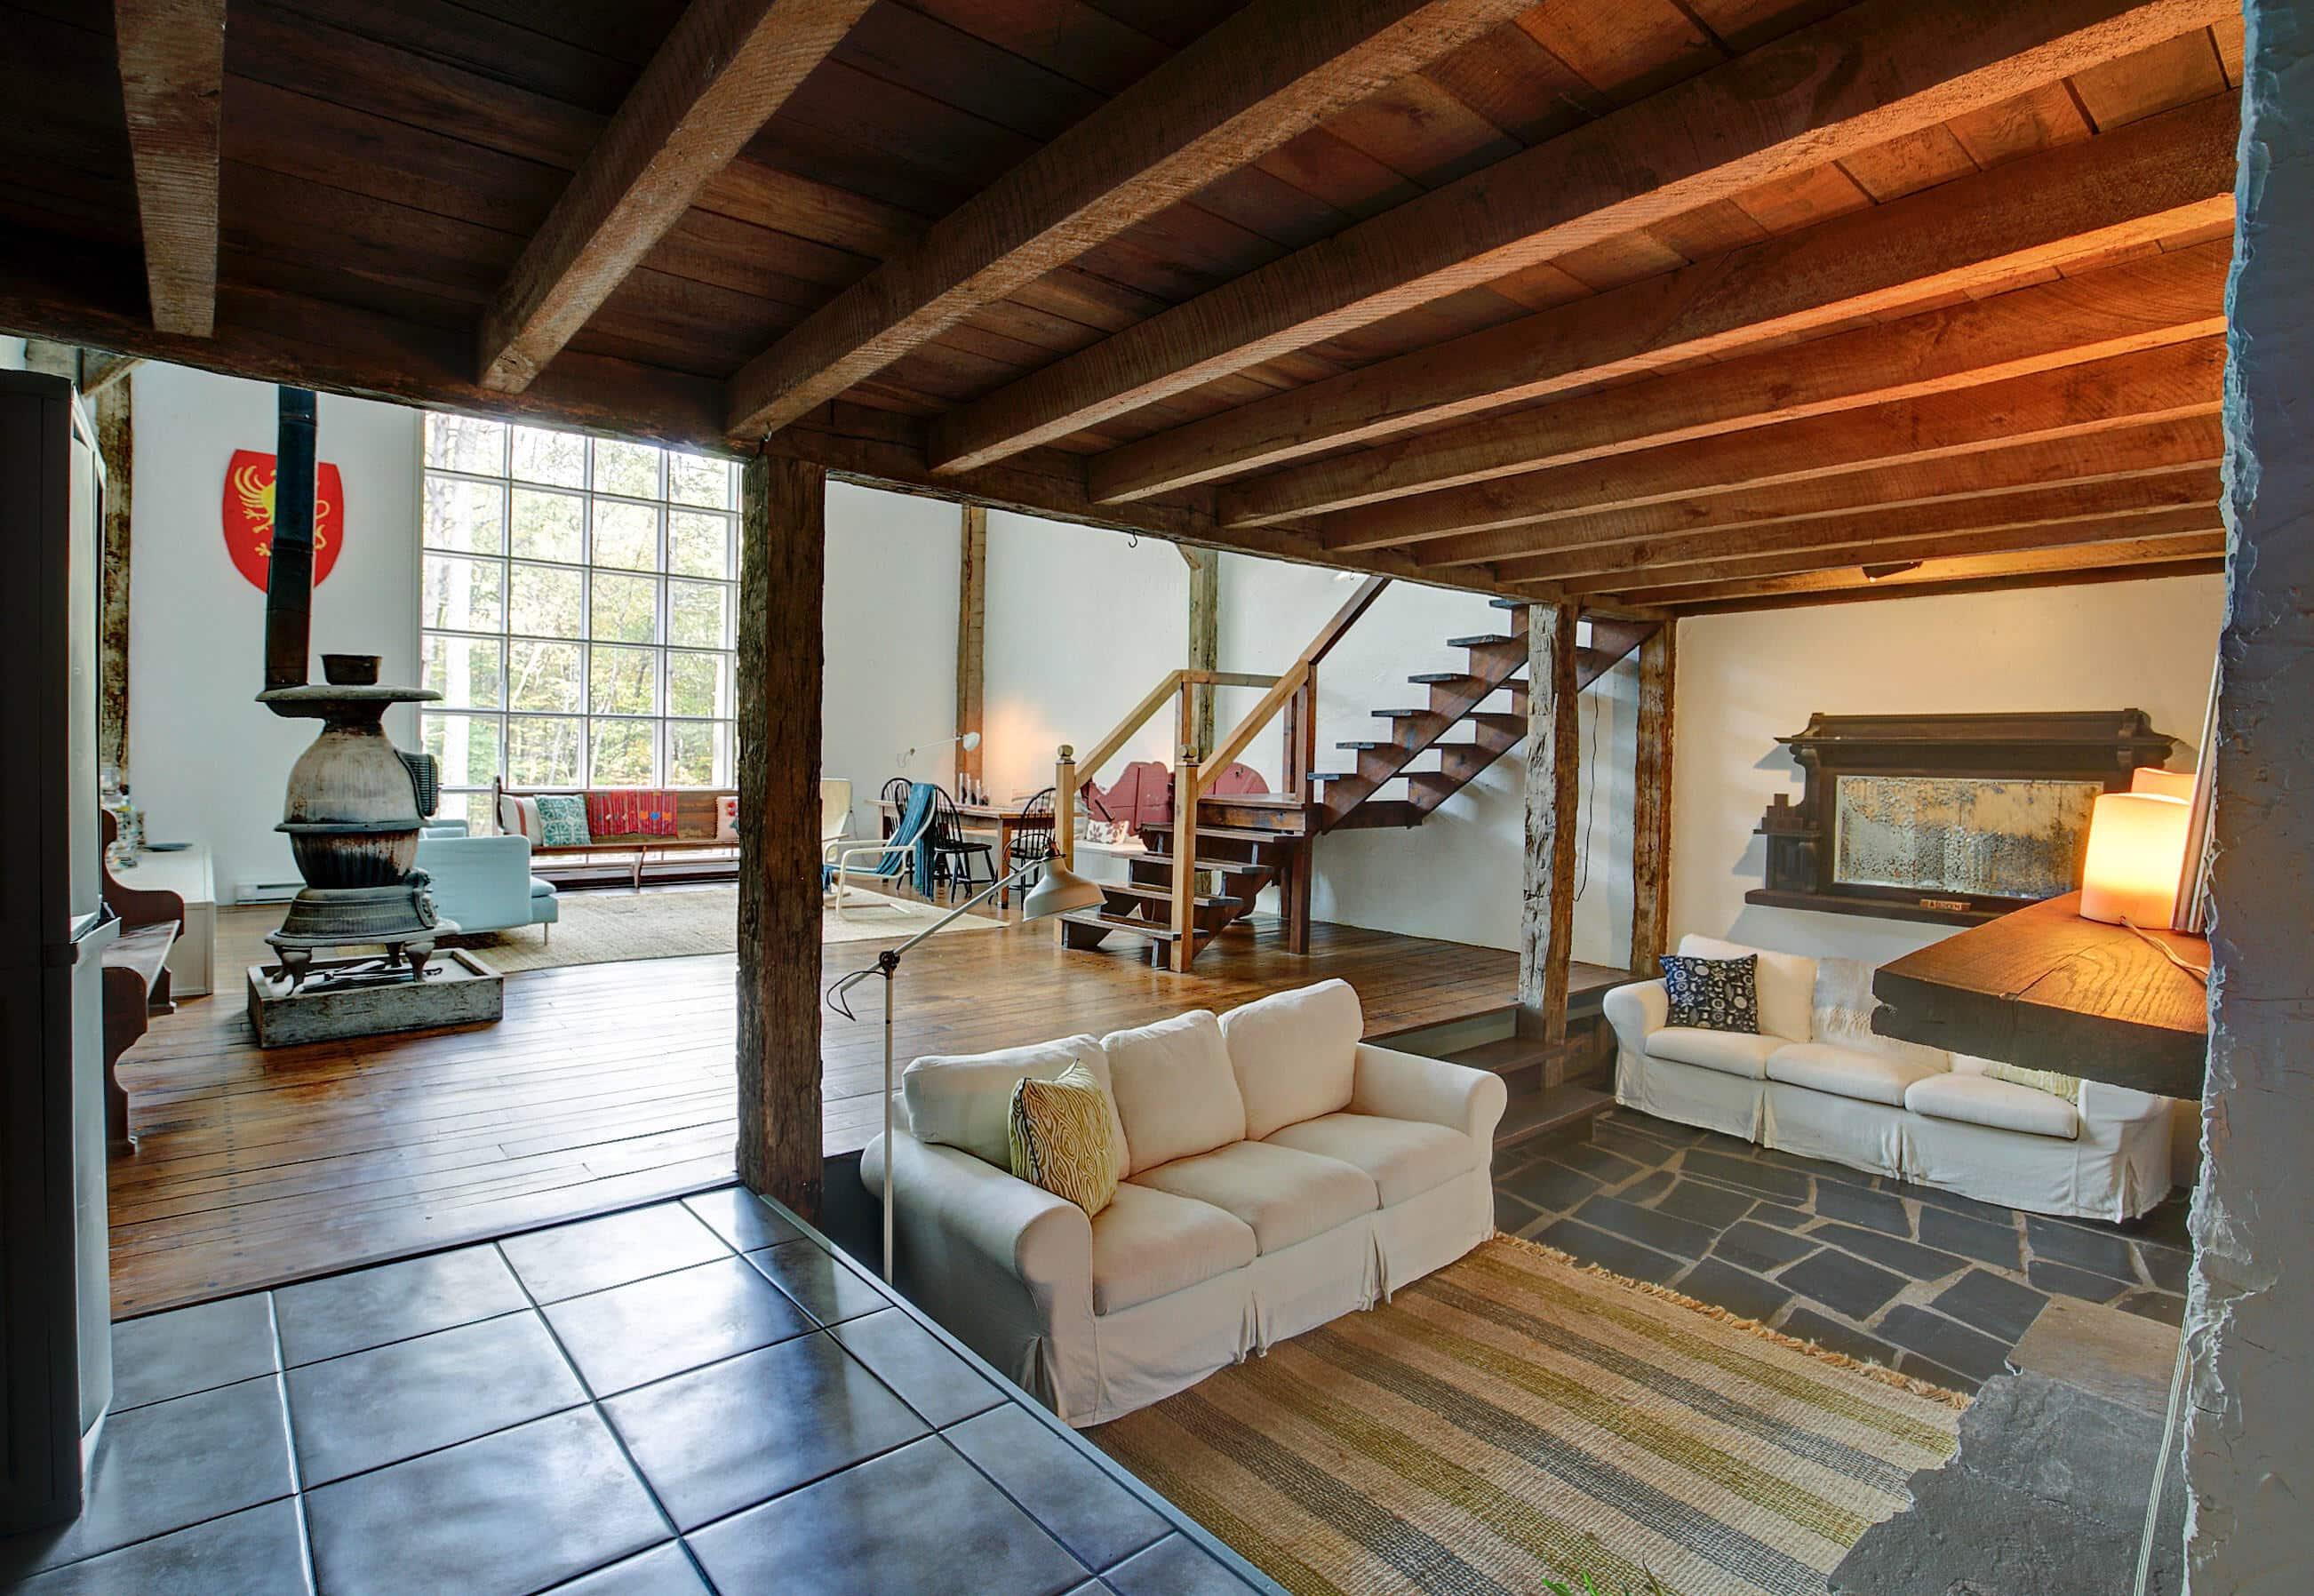 A Contemporary Country Home in Pine Bush, NY - ESCAPE BROOKLYN